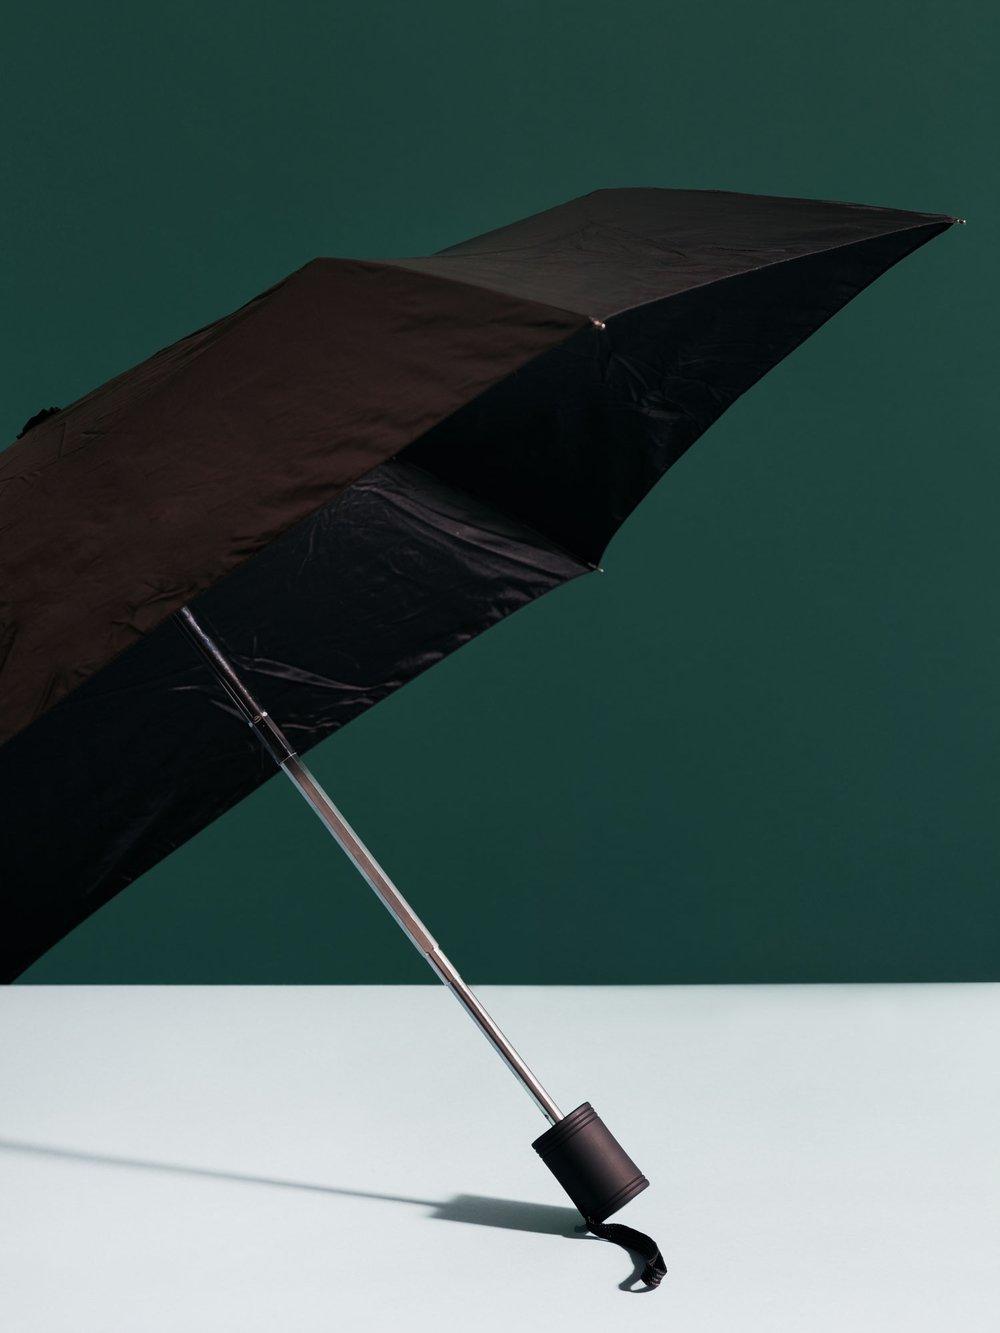 umbrella_new.jpg